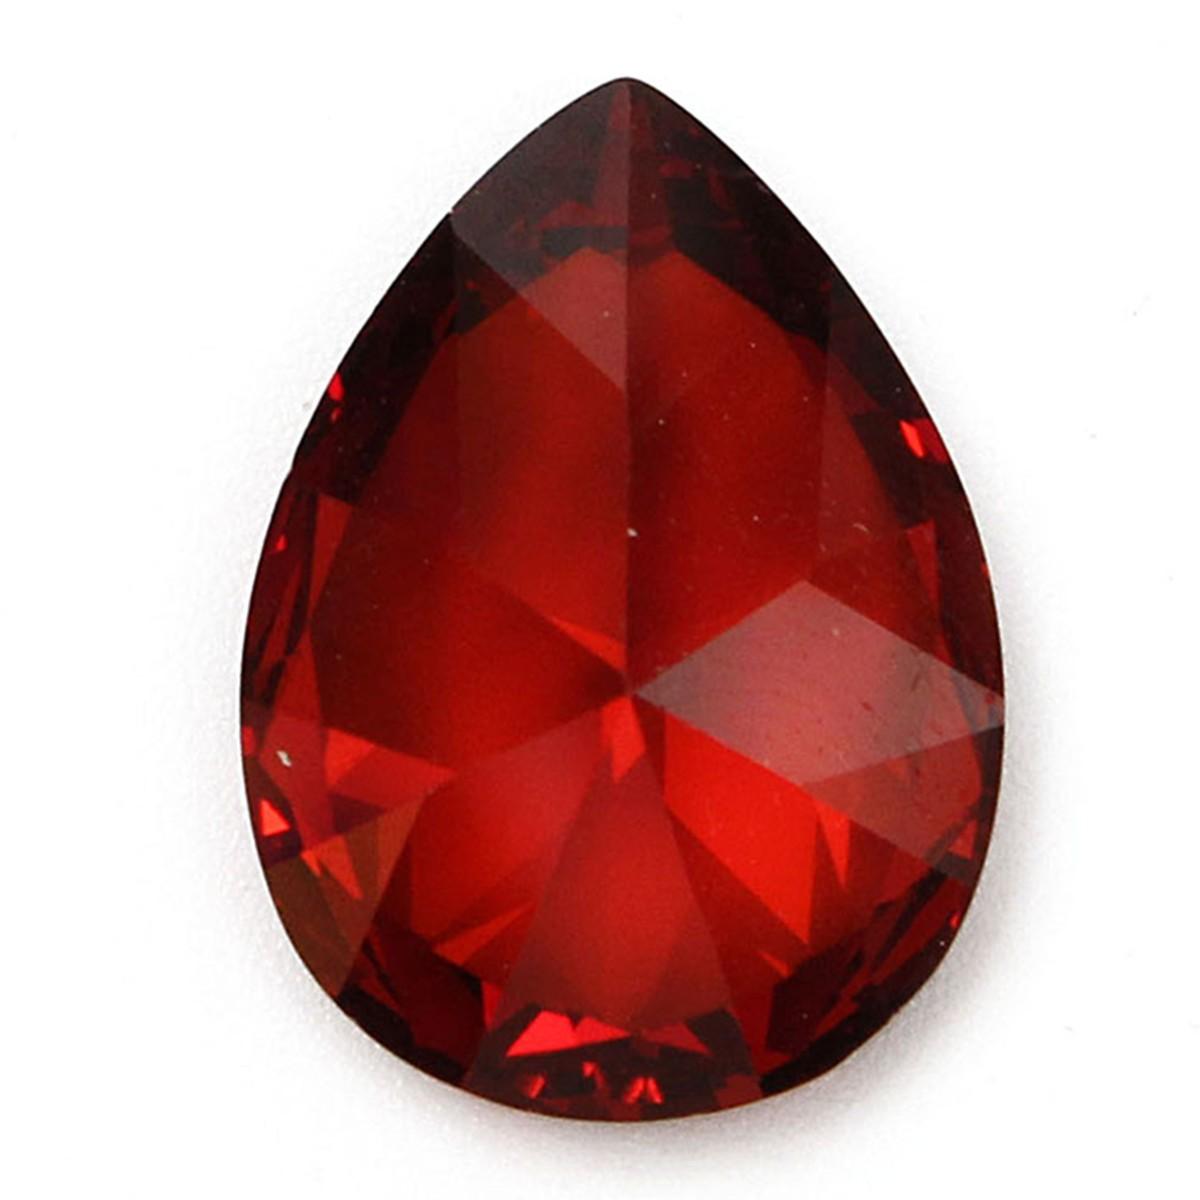 13x18mm Red Gemstone Loose Gem Diy Findings Setting Alex Nld